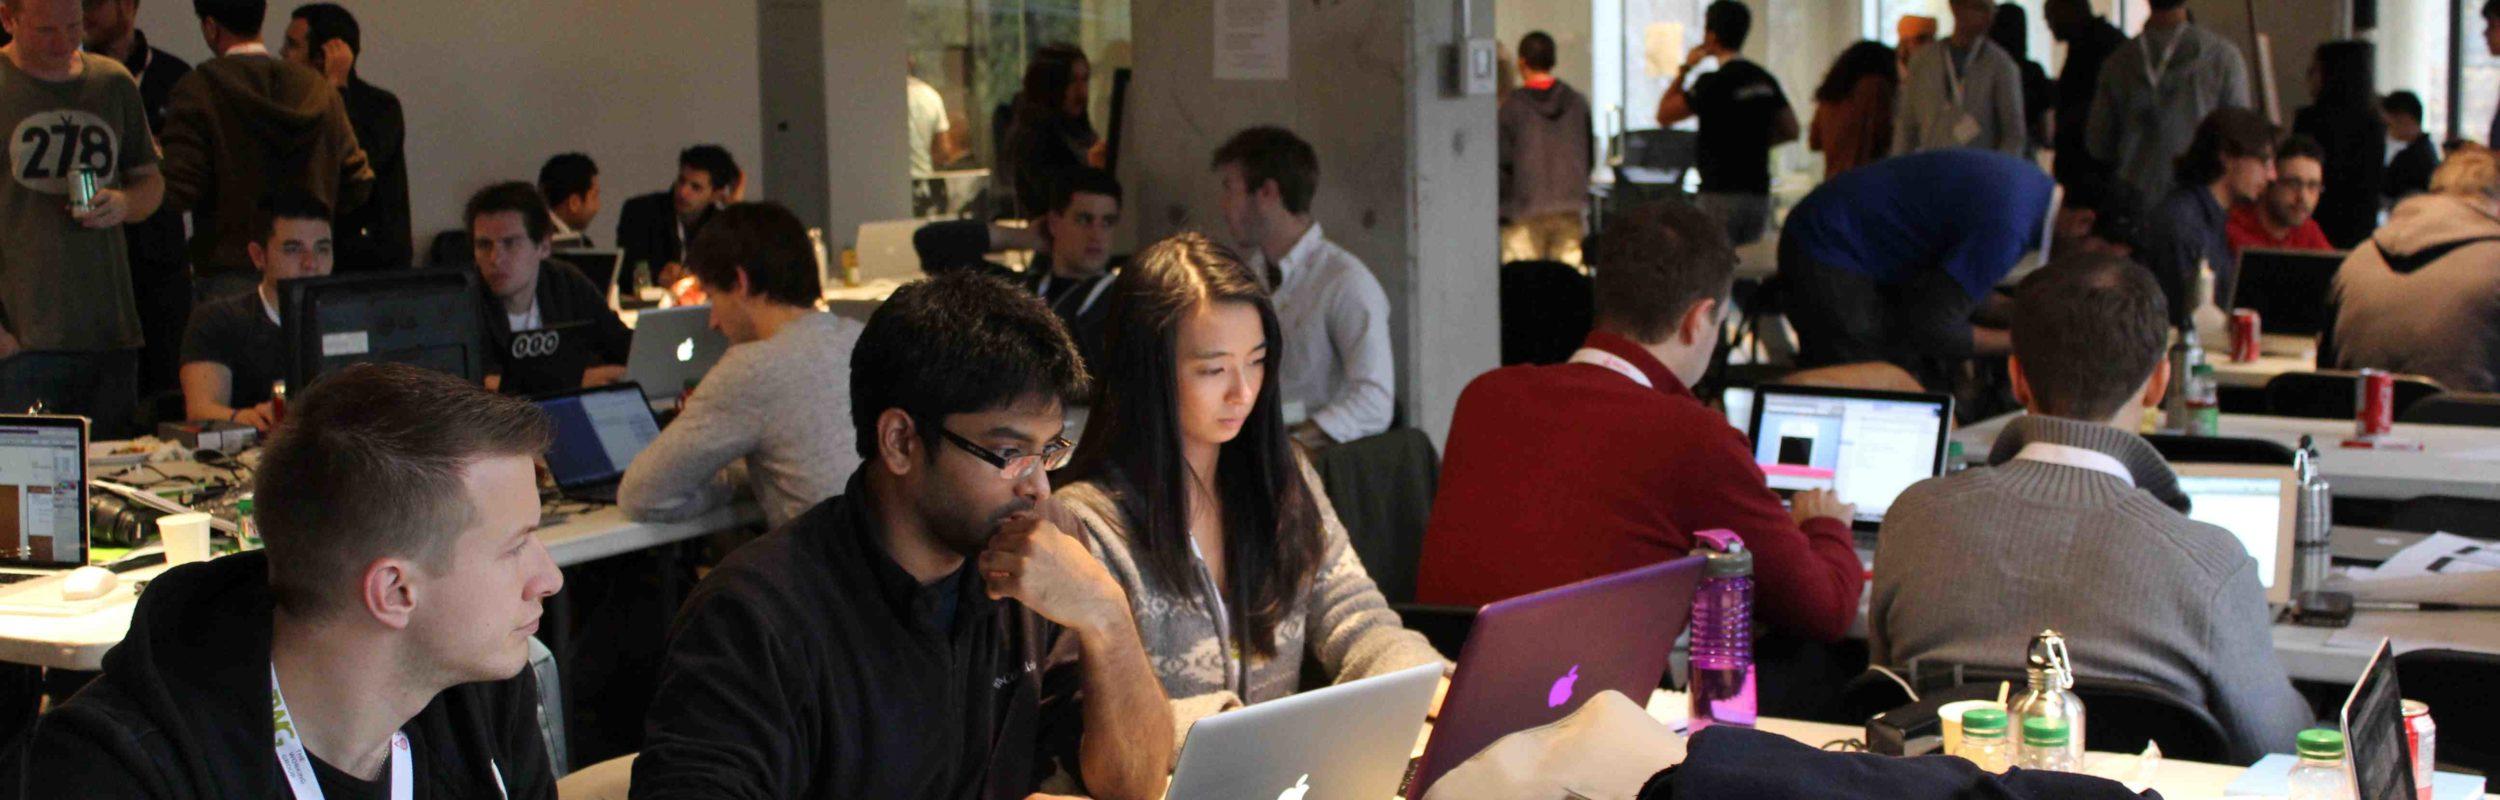 Startup Weekend Toronto : quelles différences avec les Startup Weekends de Nantes #swna #swtoronto